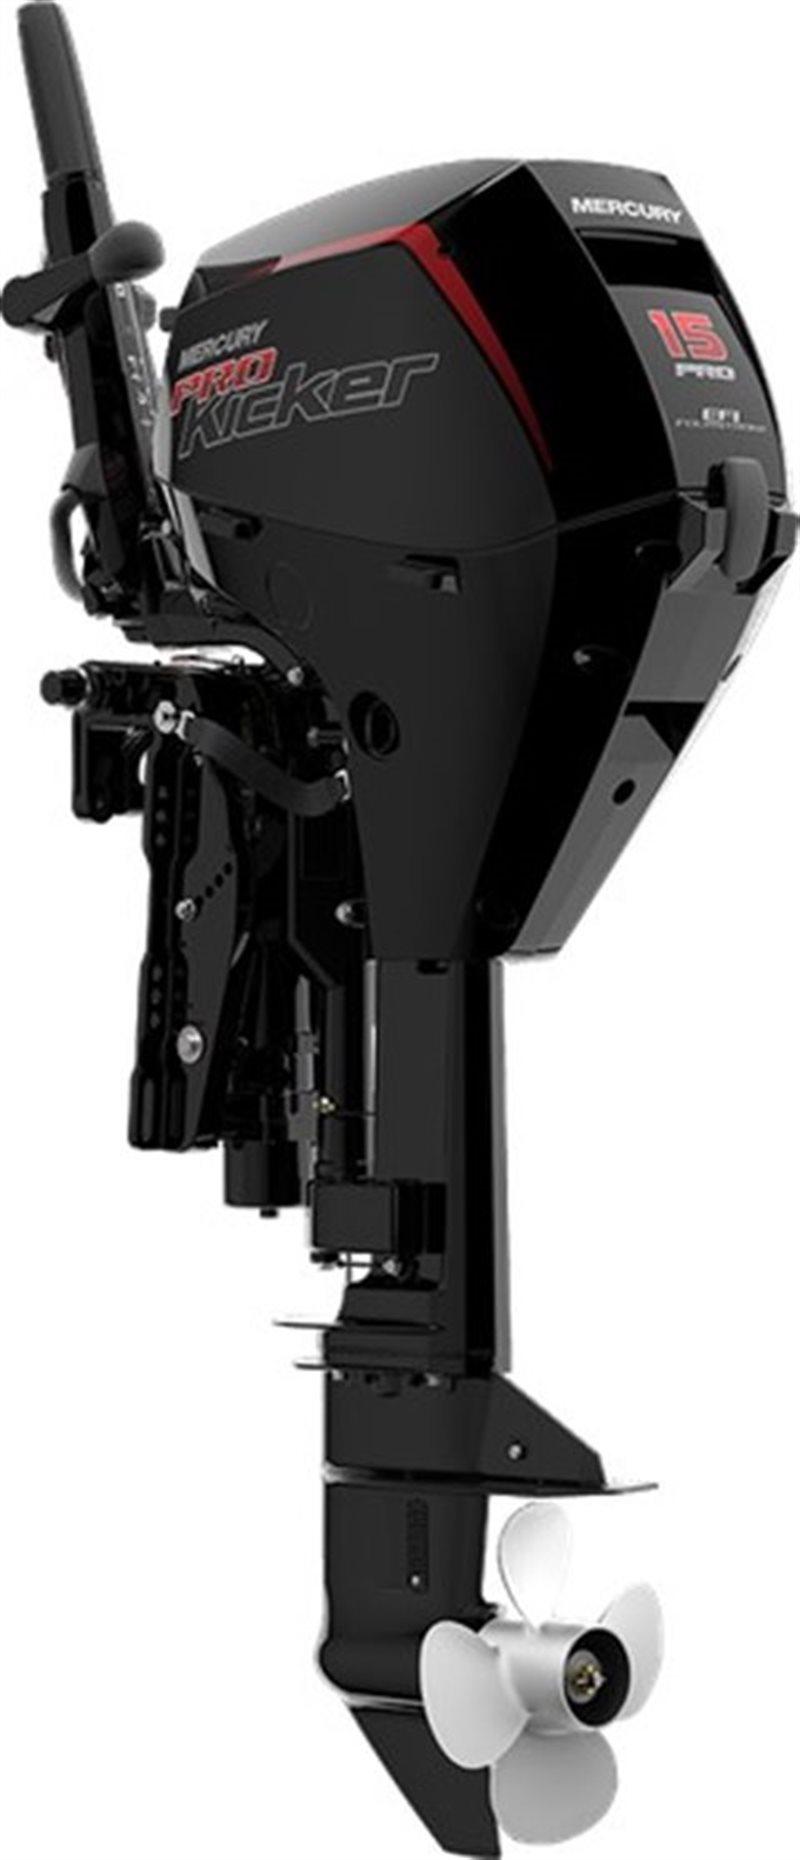 2021 Mercury Outboard FourStroke 15-20 hp 15 EFI at Pharo Marine, Waunakee, WI 53597